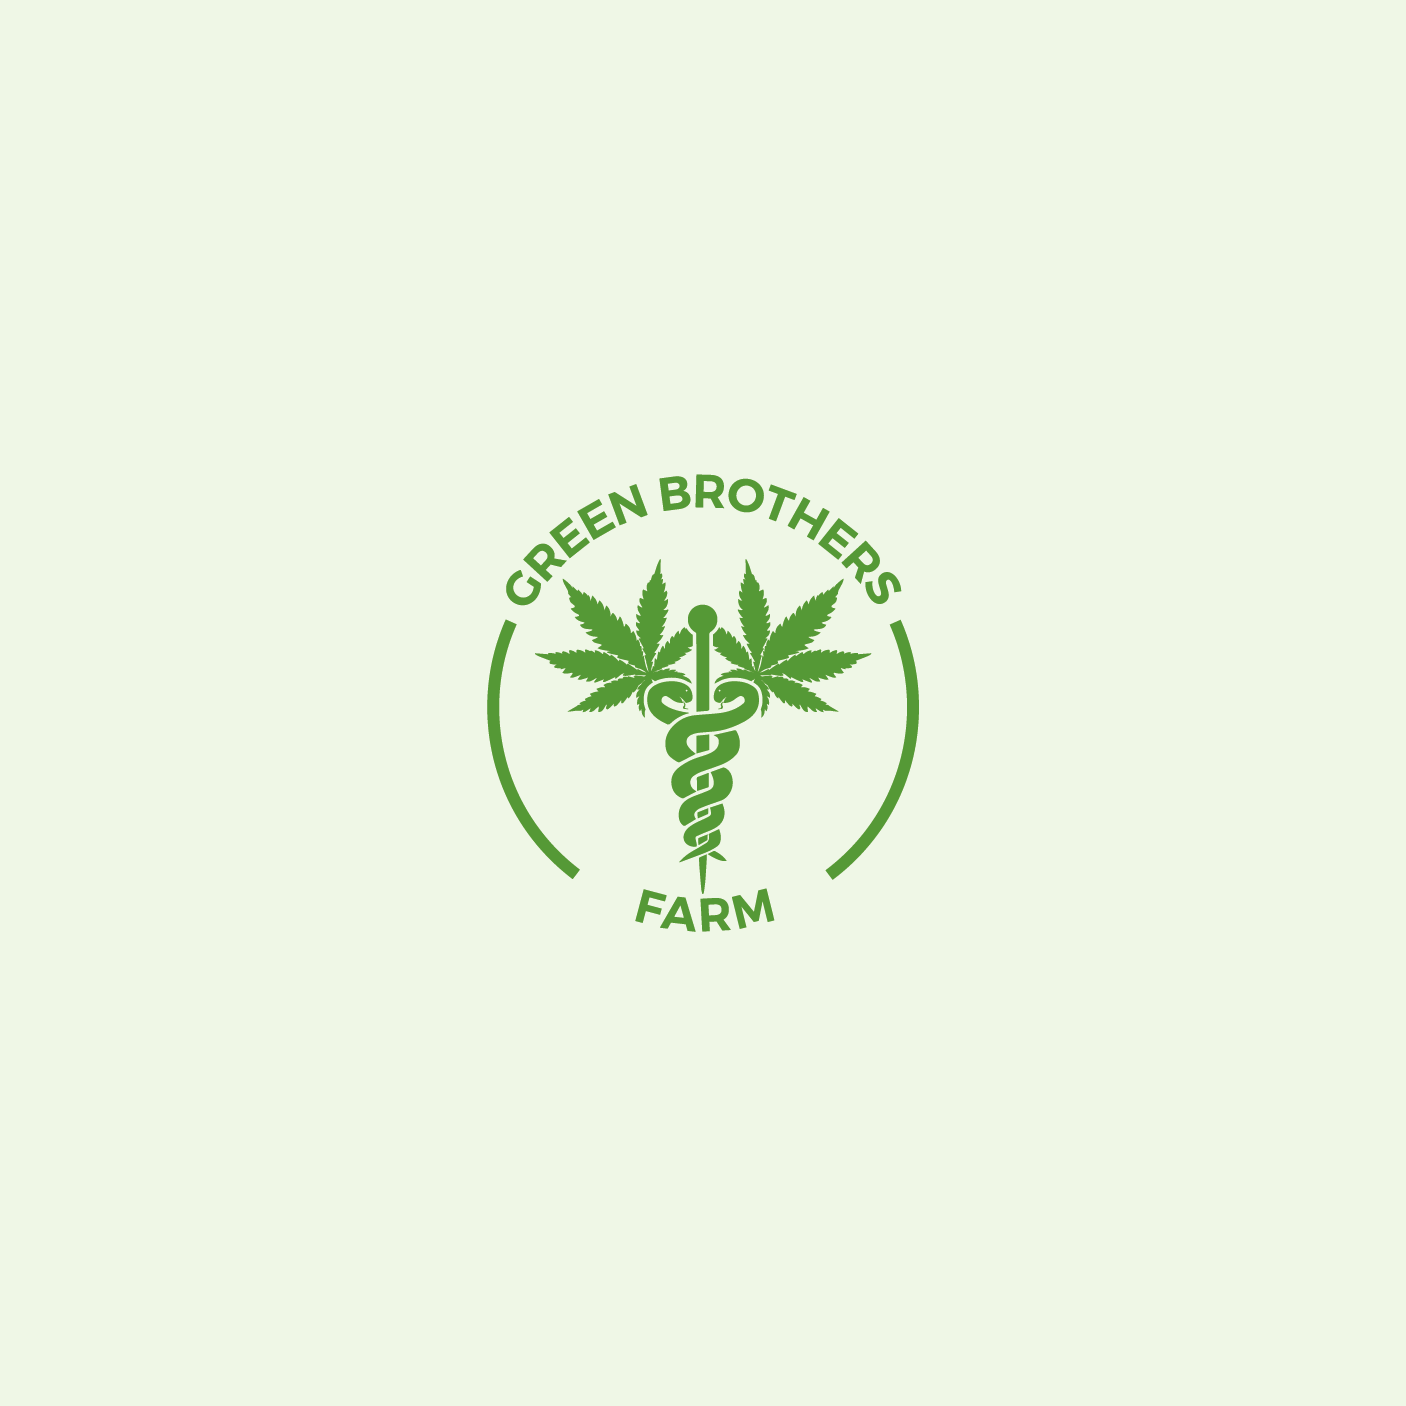 Logo Design by 354studio - Entry No. 59 in the Logo Design Contest Green Brothers Farm Logo Design.